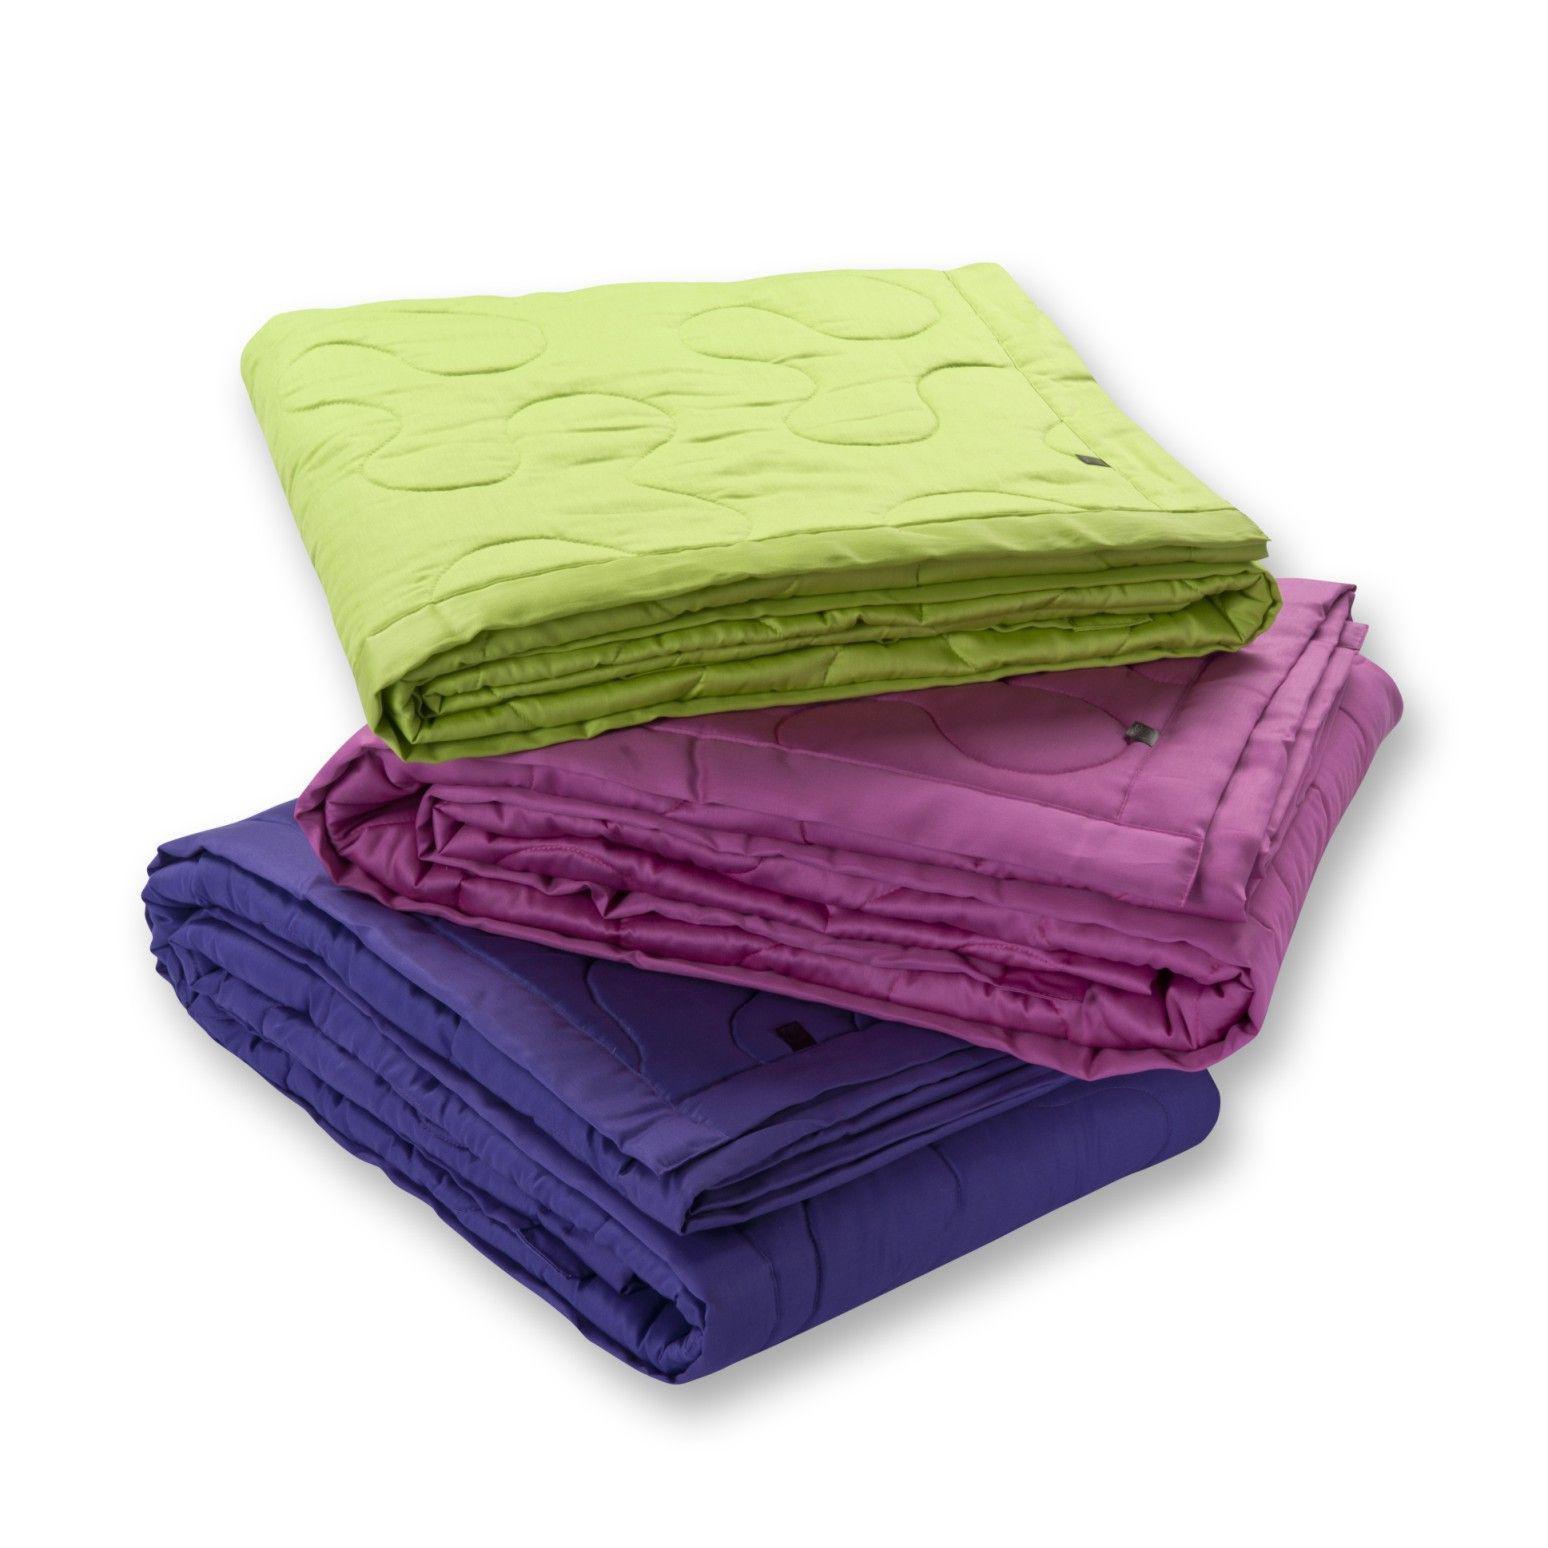 Bali - bedspreads